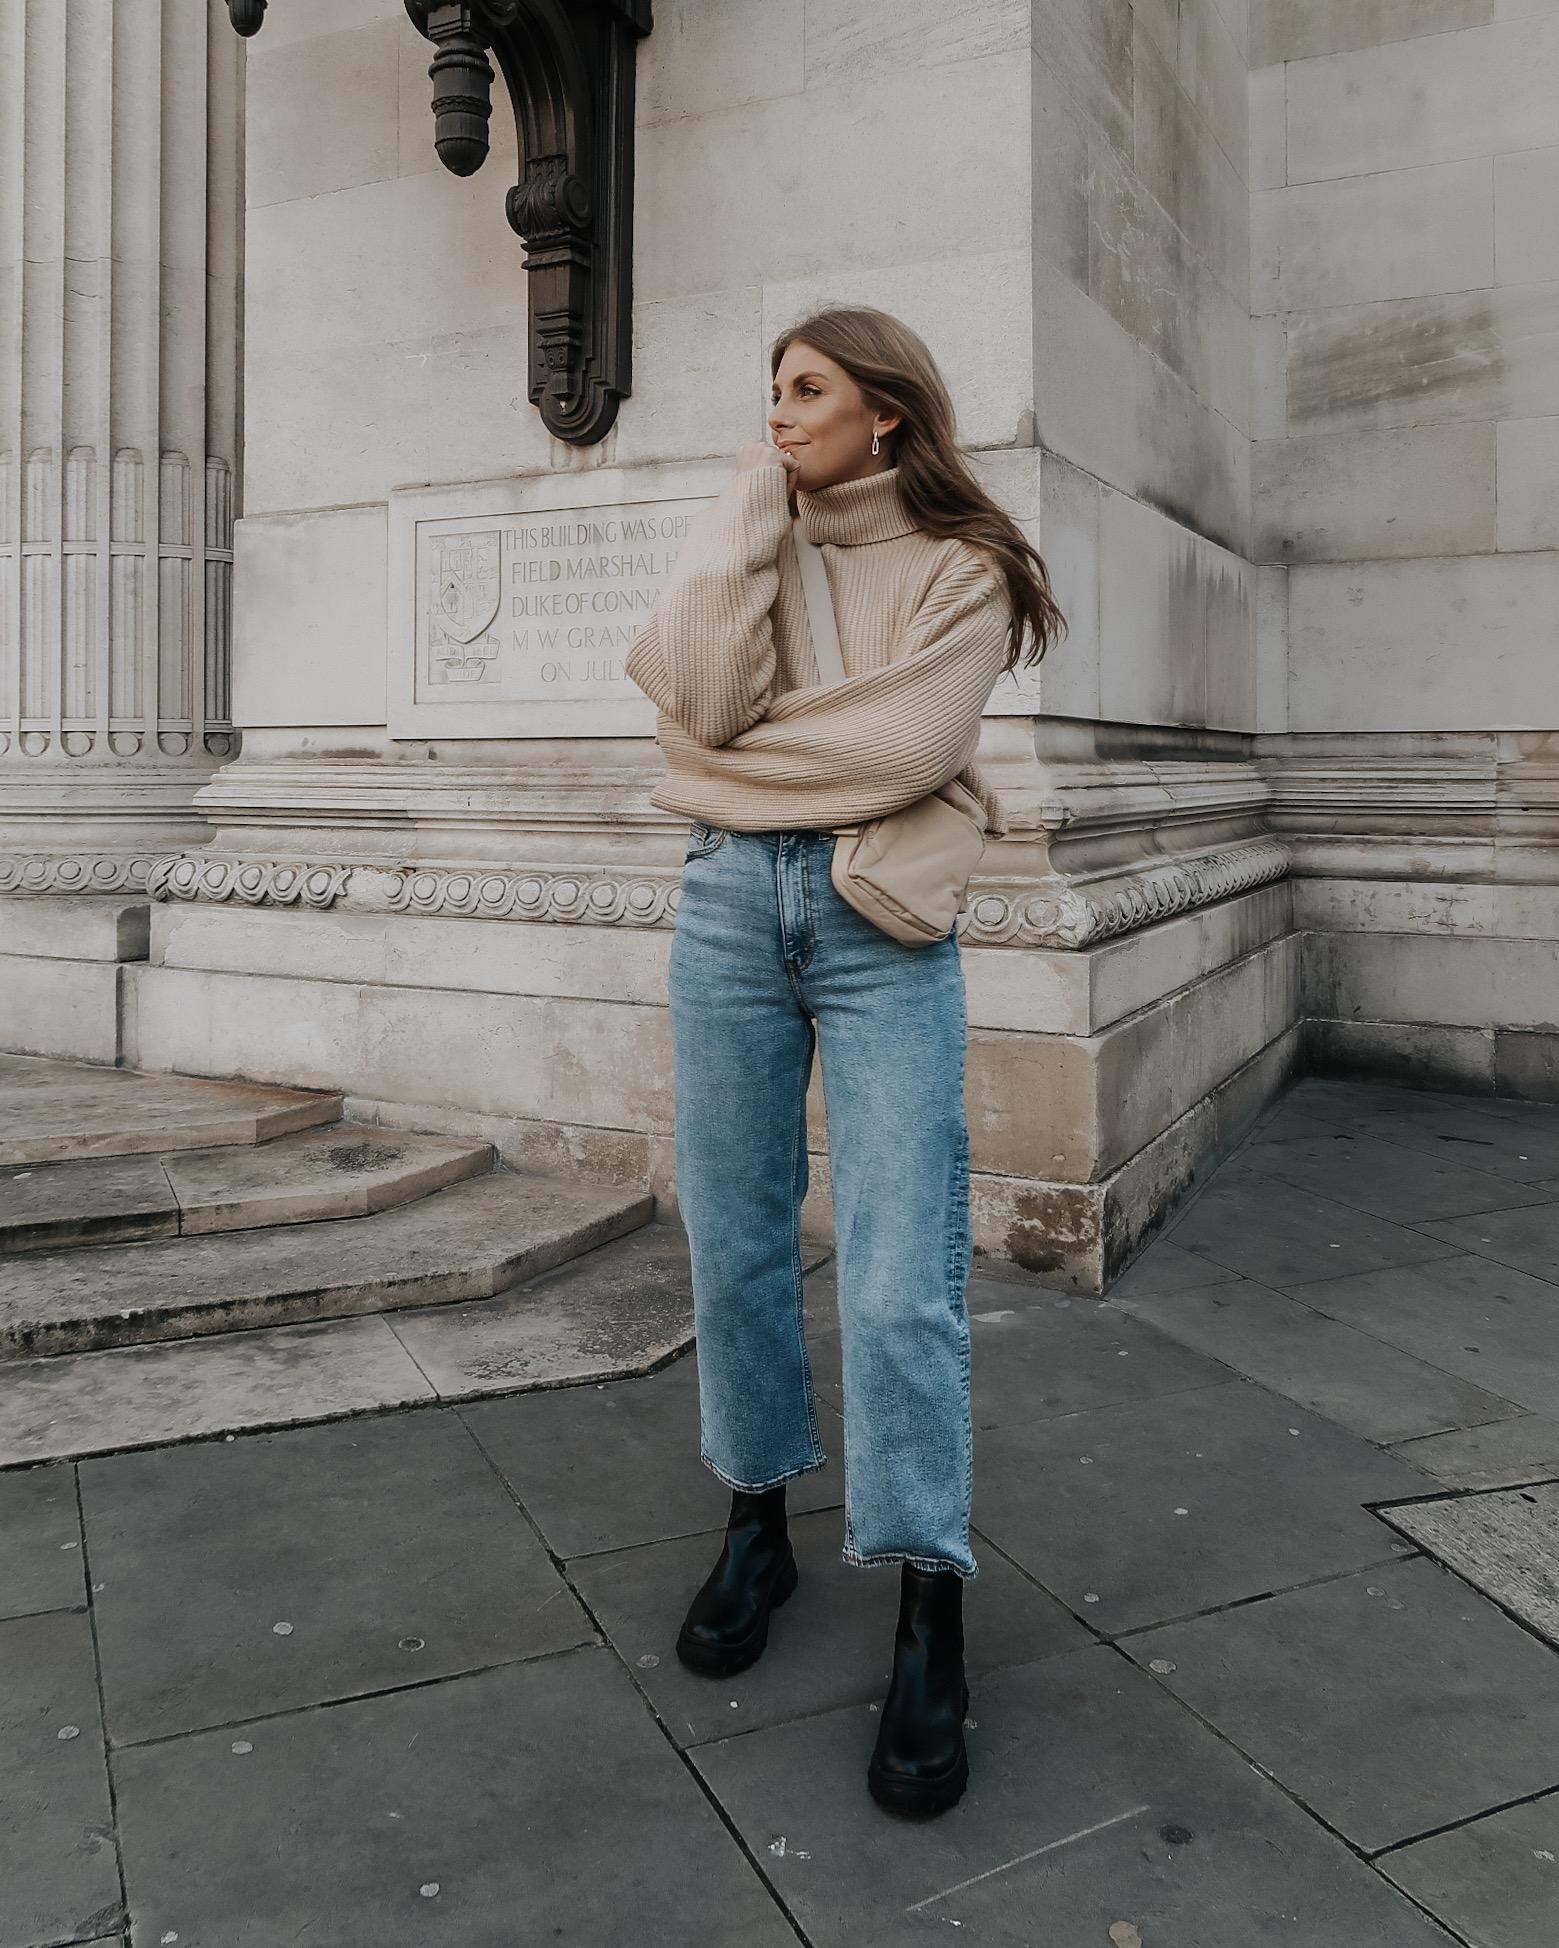 Monki Jeans - Outfit Ideas